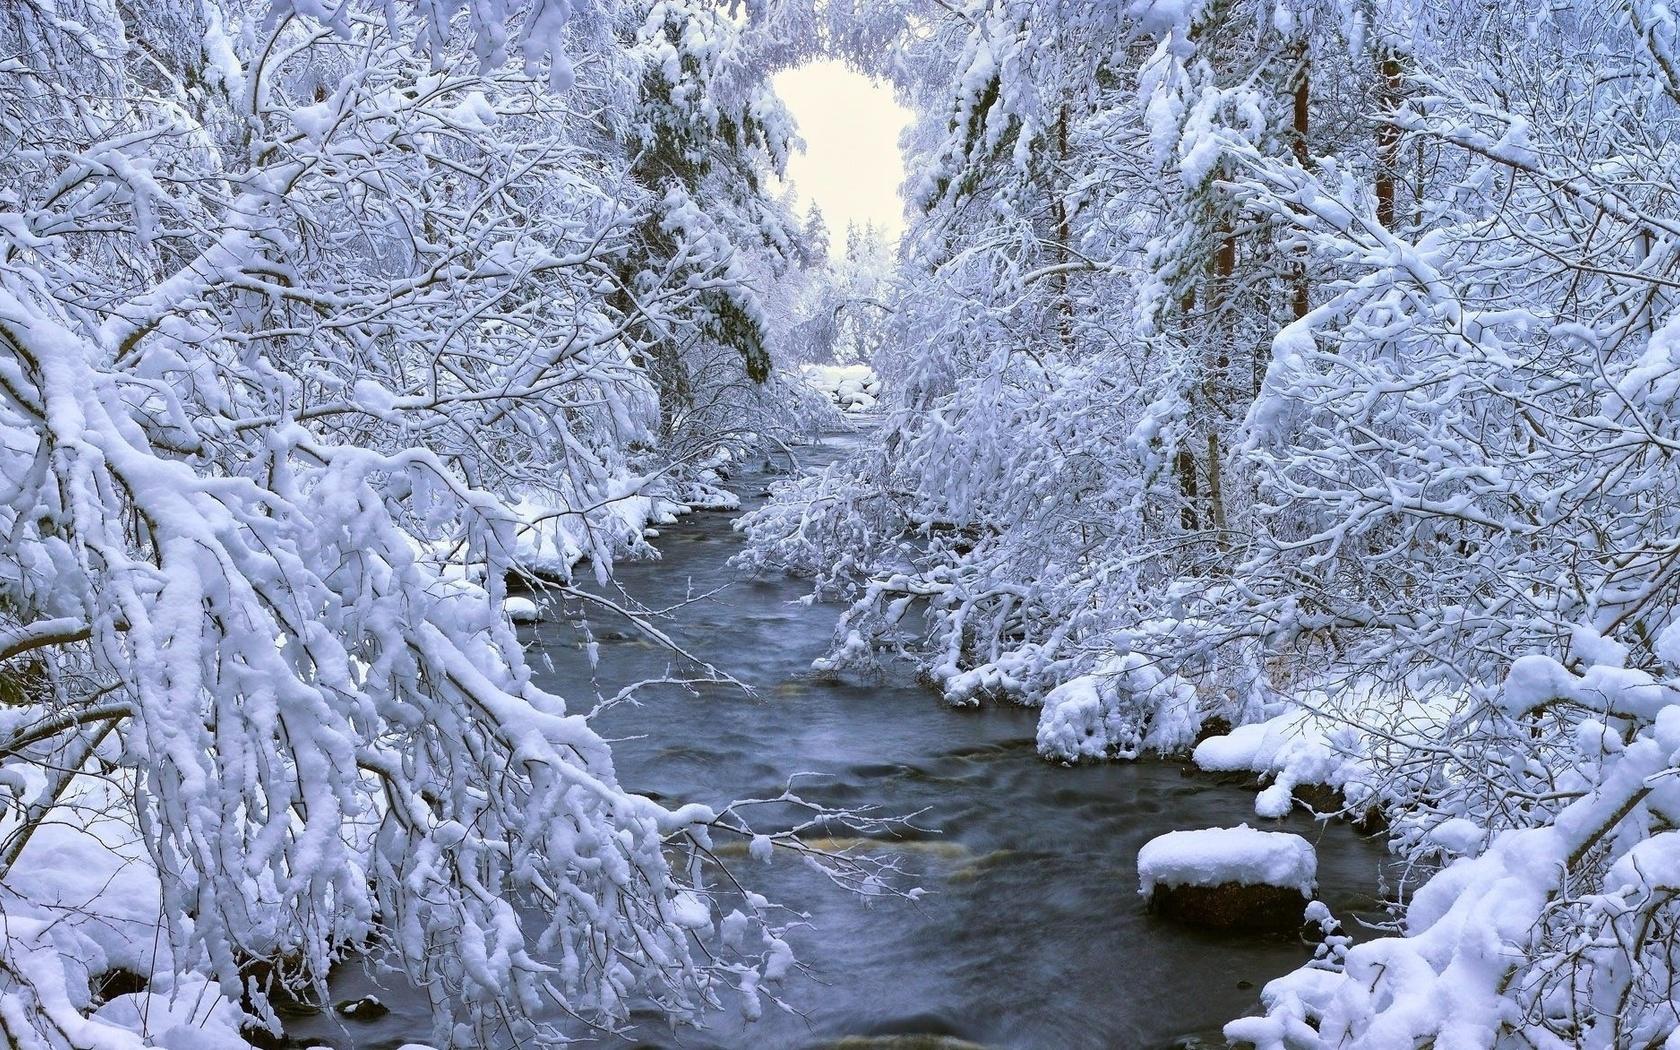 картинки река заснеженная разбираются